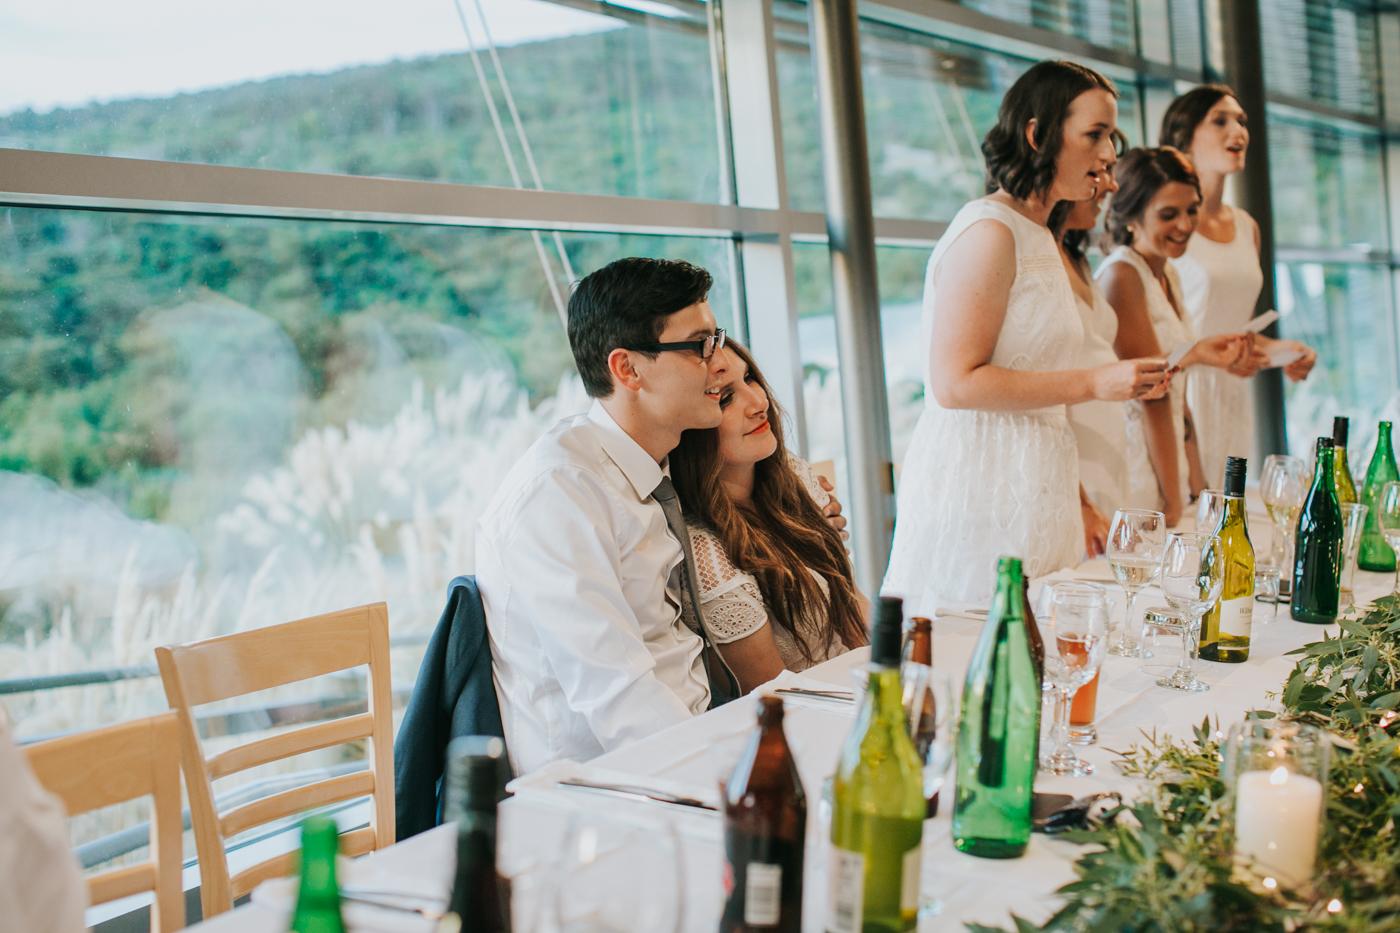 Ariana & Tim - Dunedin, New Zealand Wedding - Destination Wedding - Samantha Heather Photography-245.jpg